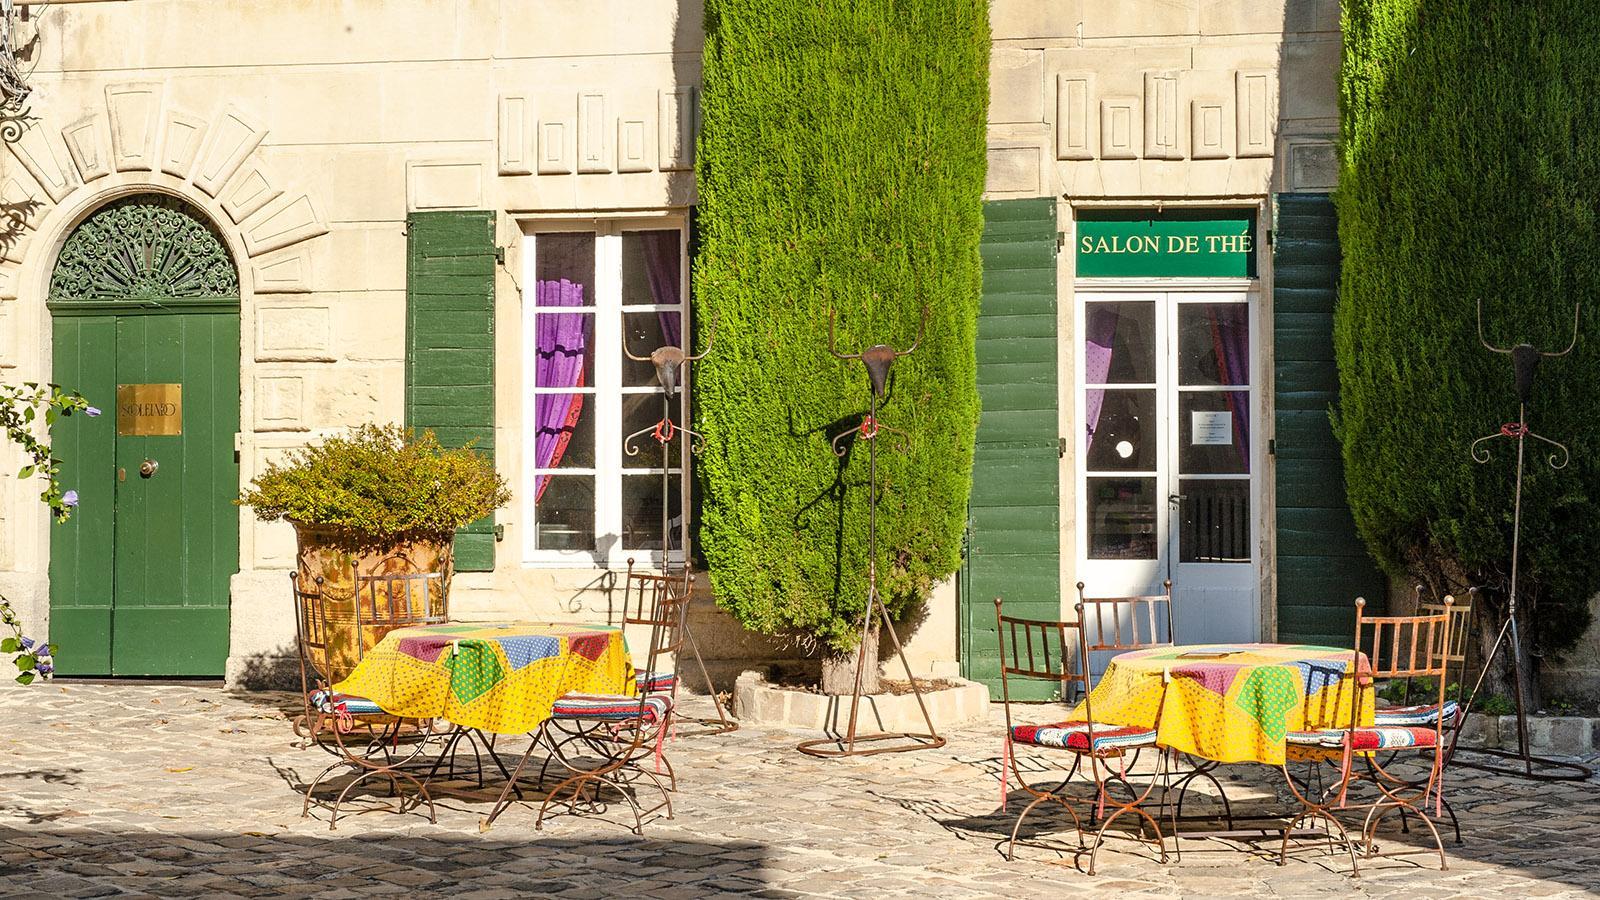 Tarascon: Innenhofcafe von Souleiado. Foto: Hilke Maunder